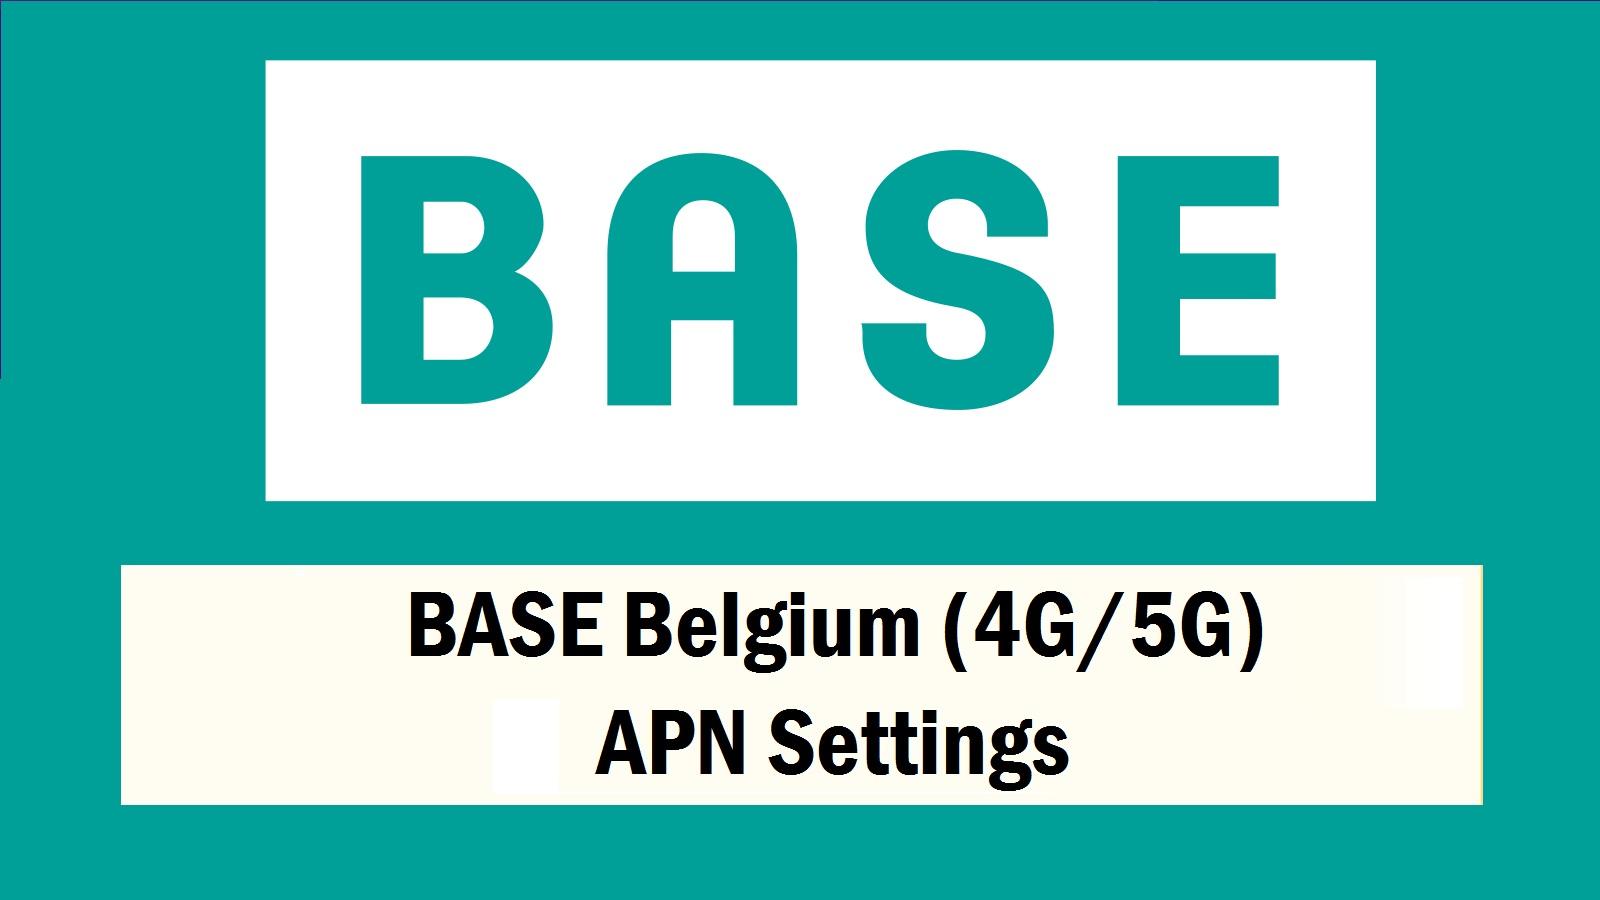 BASE Belgium APN Settings